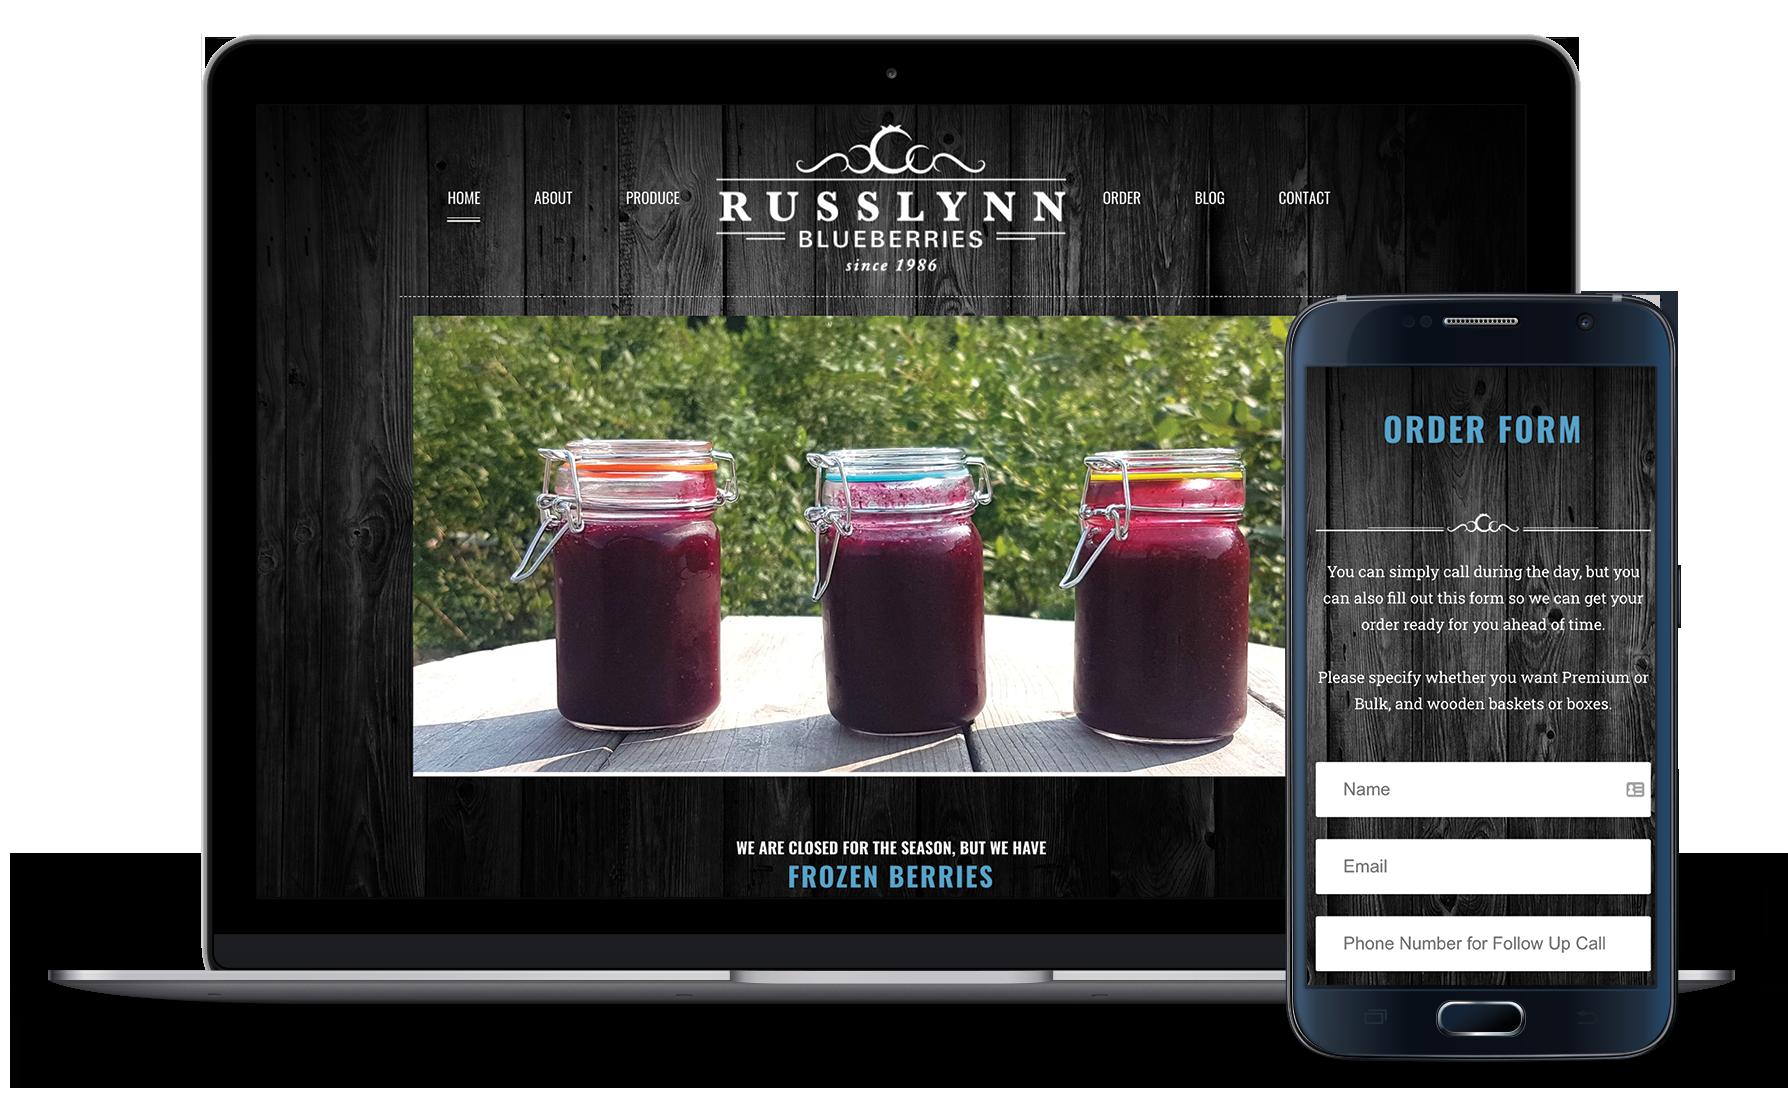 RussLynn---Website 4